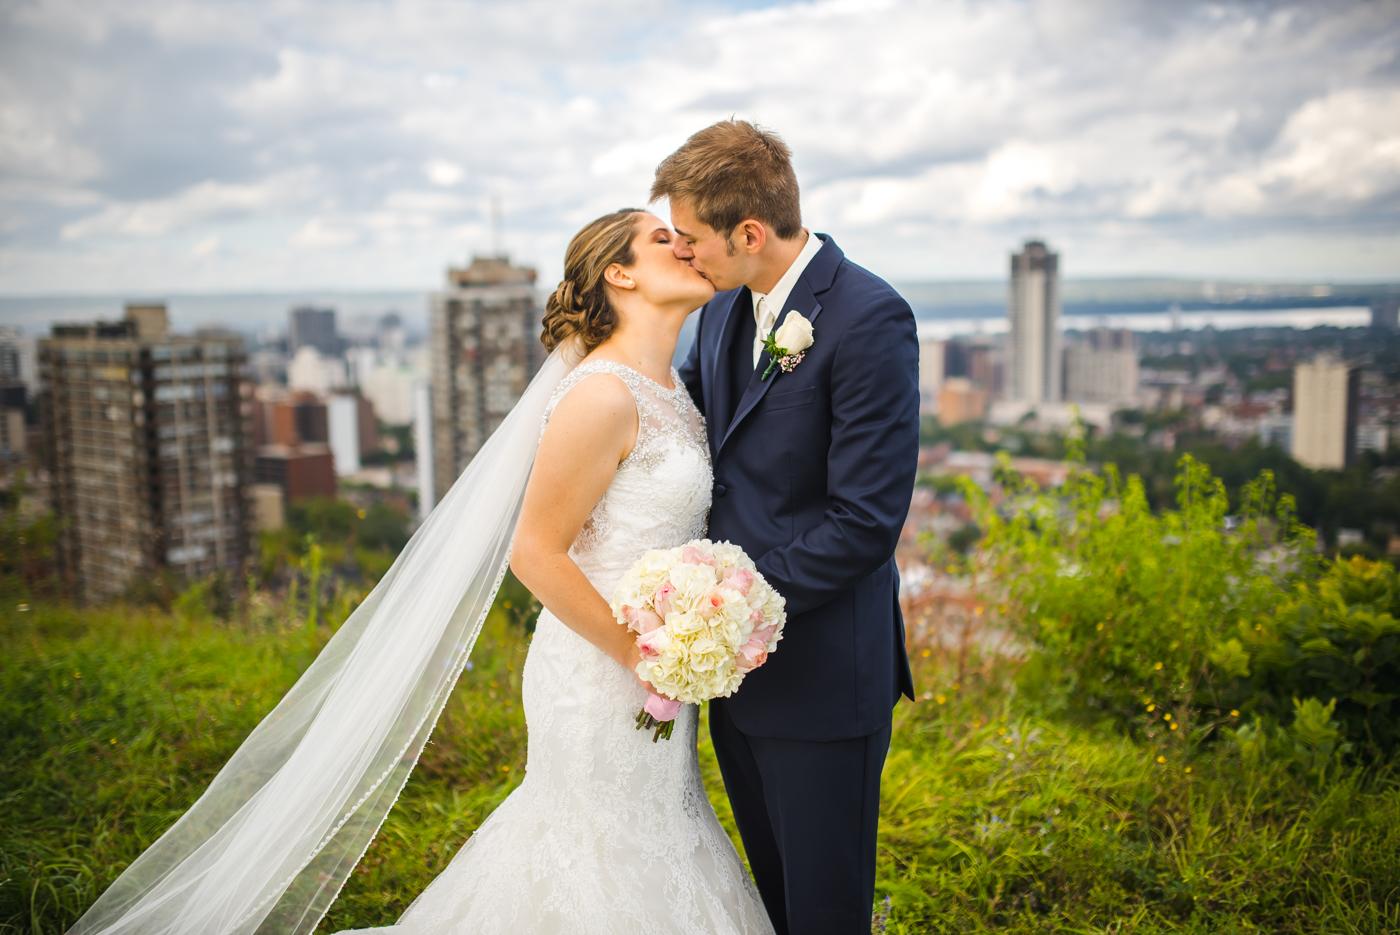 Carmens-Banquet-Centre-Reception-Hamilton-Sam-Lawrence-Park-September-Wedding-Alex-and-Emily-66.jpg